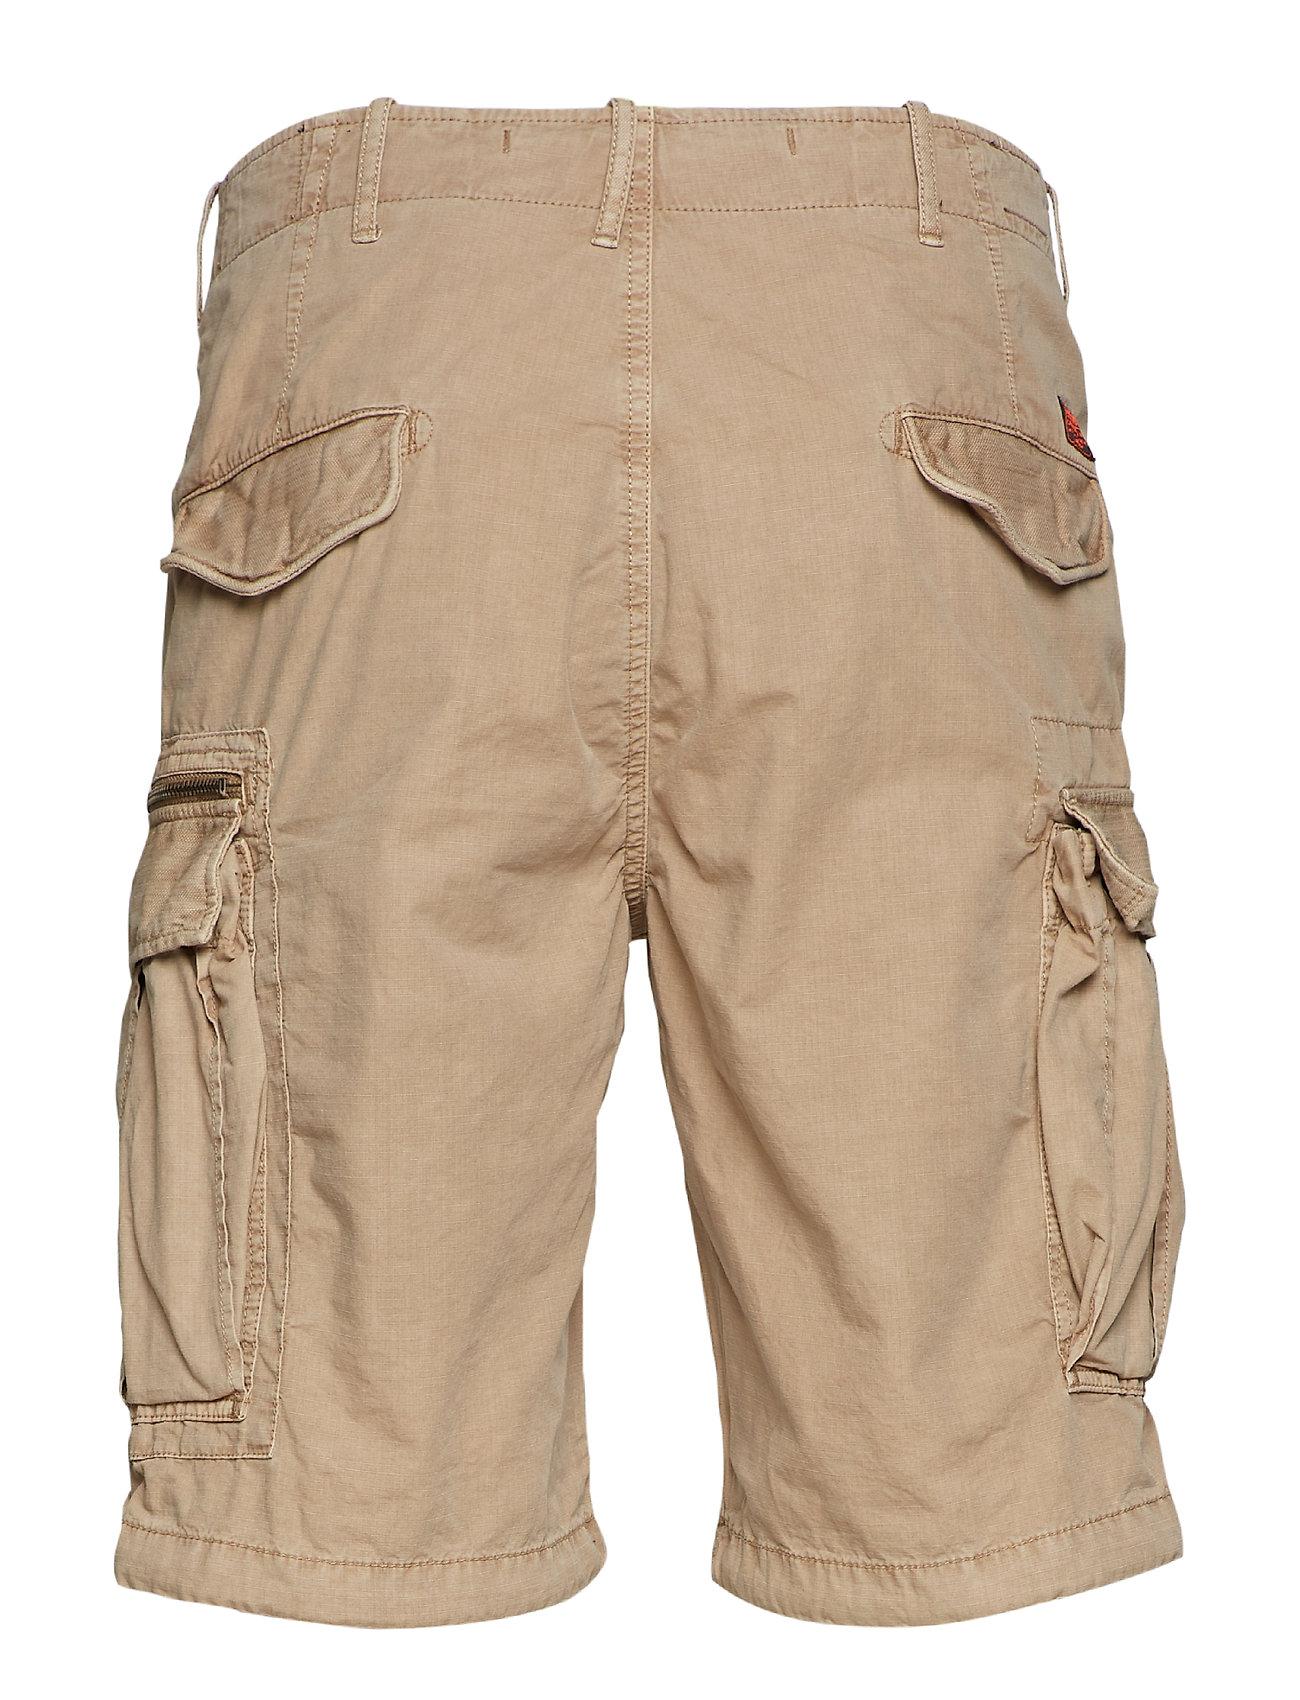 Parachute Cargo Short Shorts Casual Beige Superdry